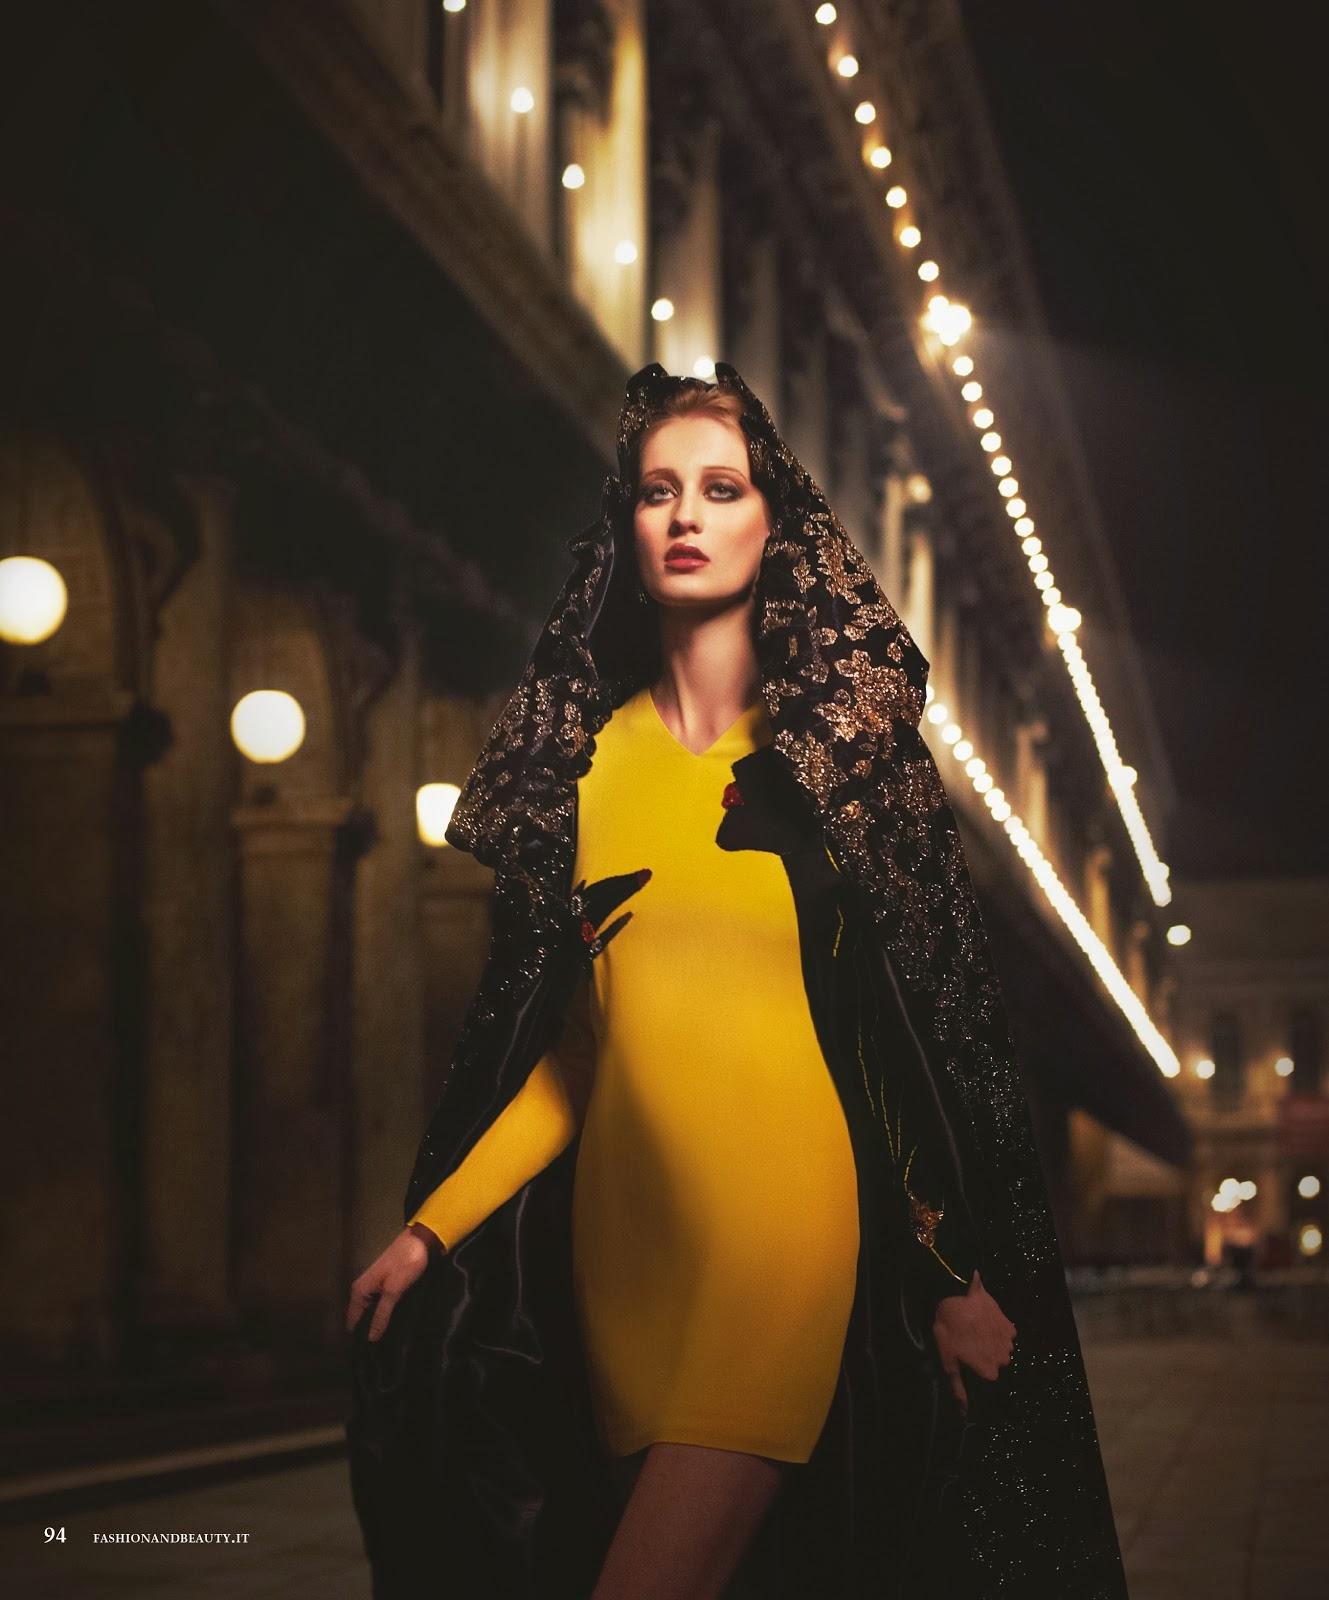 Young Enya Bakunova nudes (46 photos), Pussy, Fappening, Selfie, cameltoe 2018